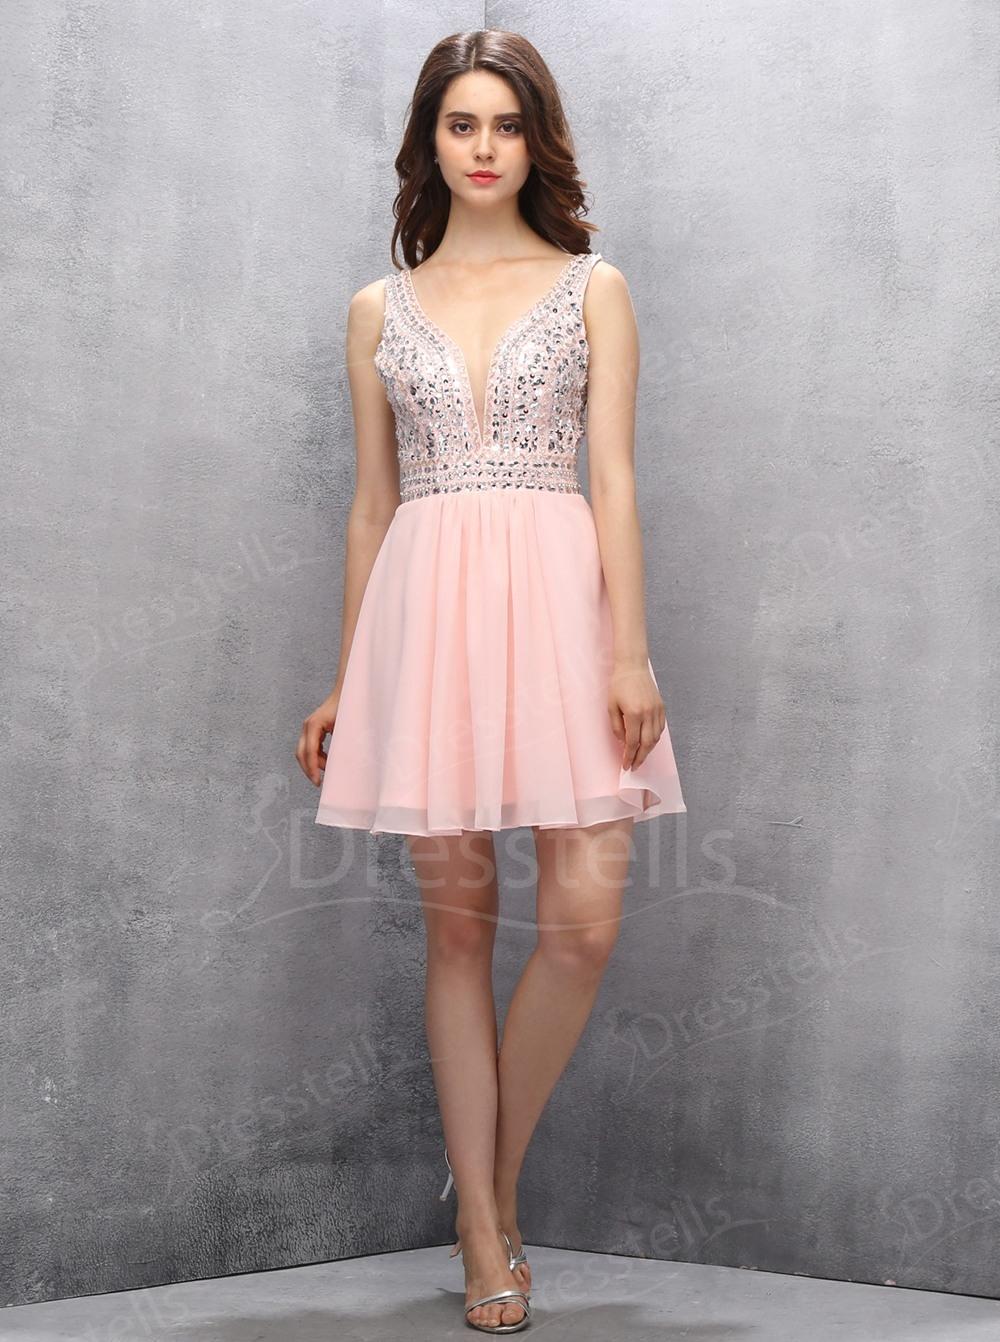 Cool Abiball Kleid Boutique17 Top Abiball Kleid Design